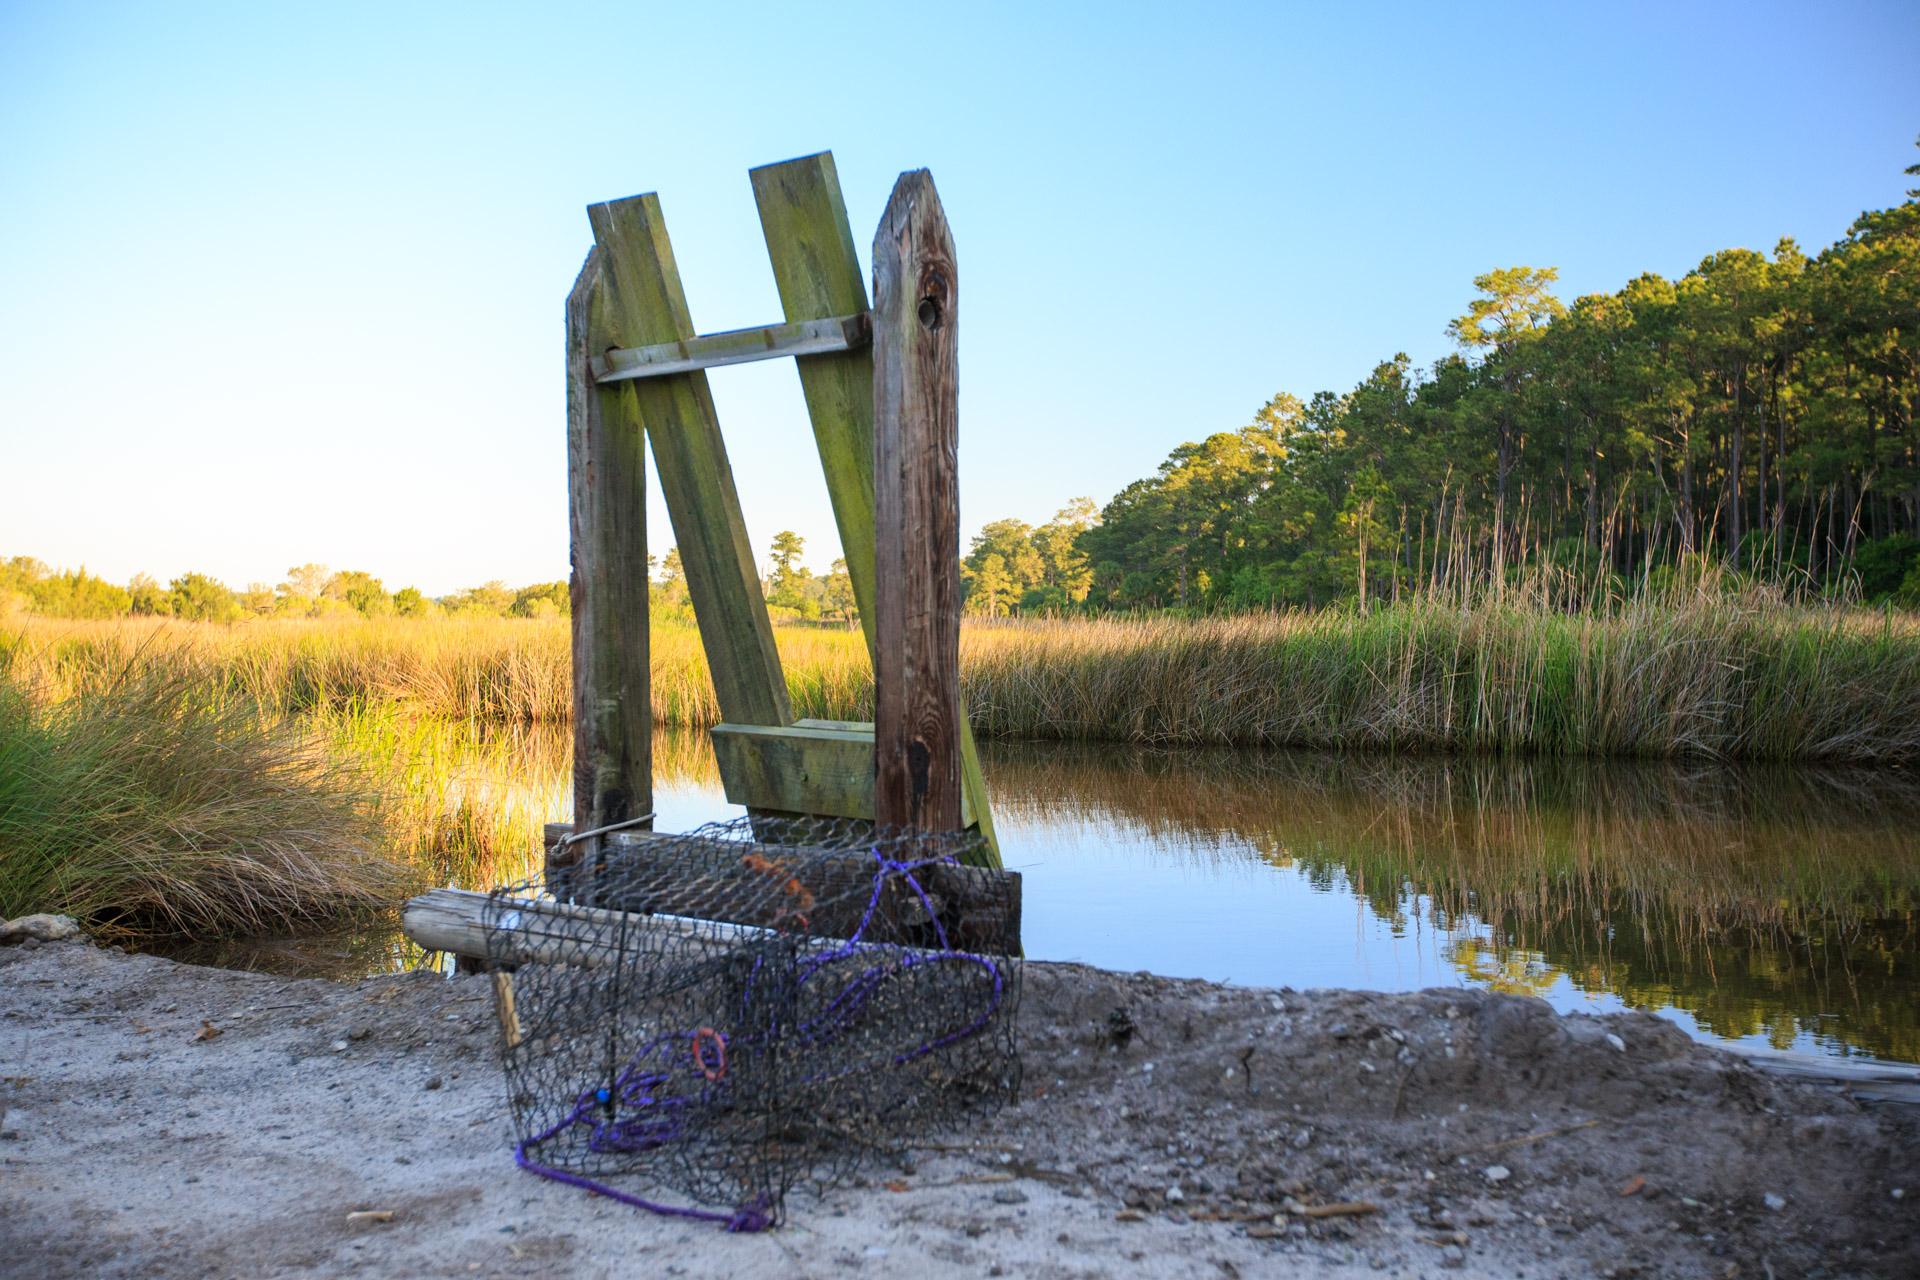 The Rice Gate & Marshlands